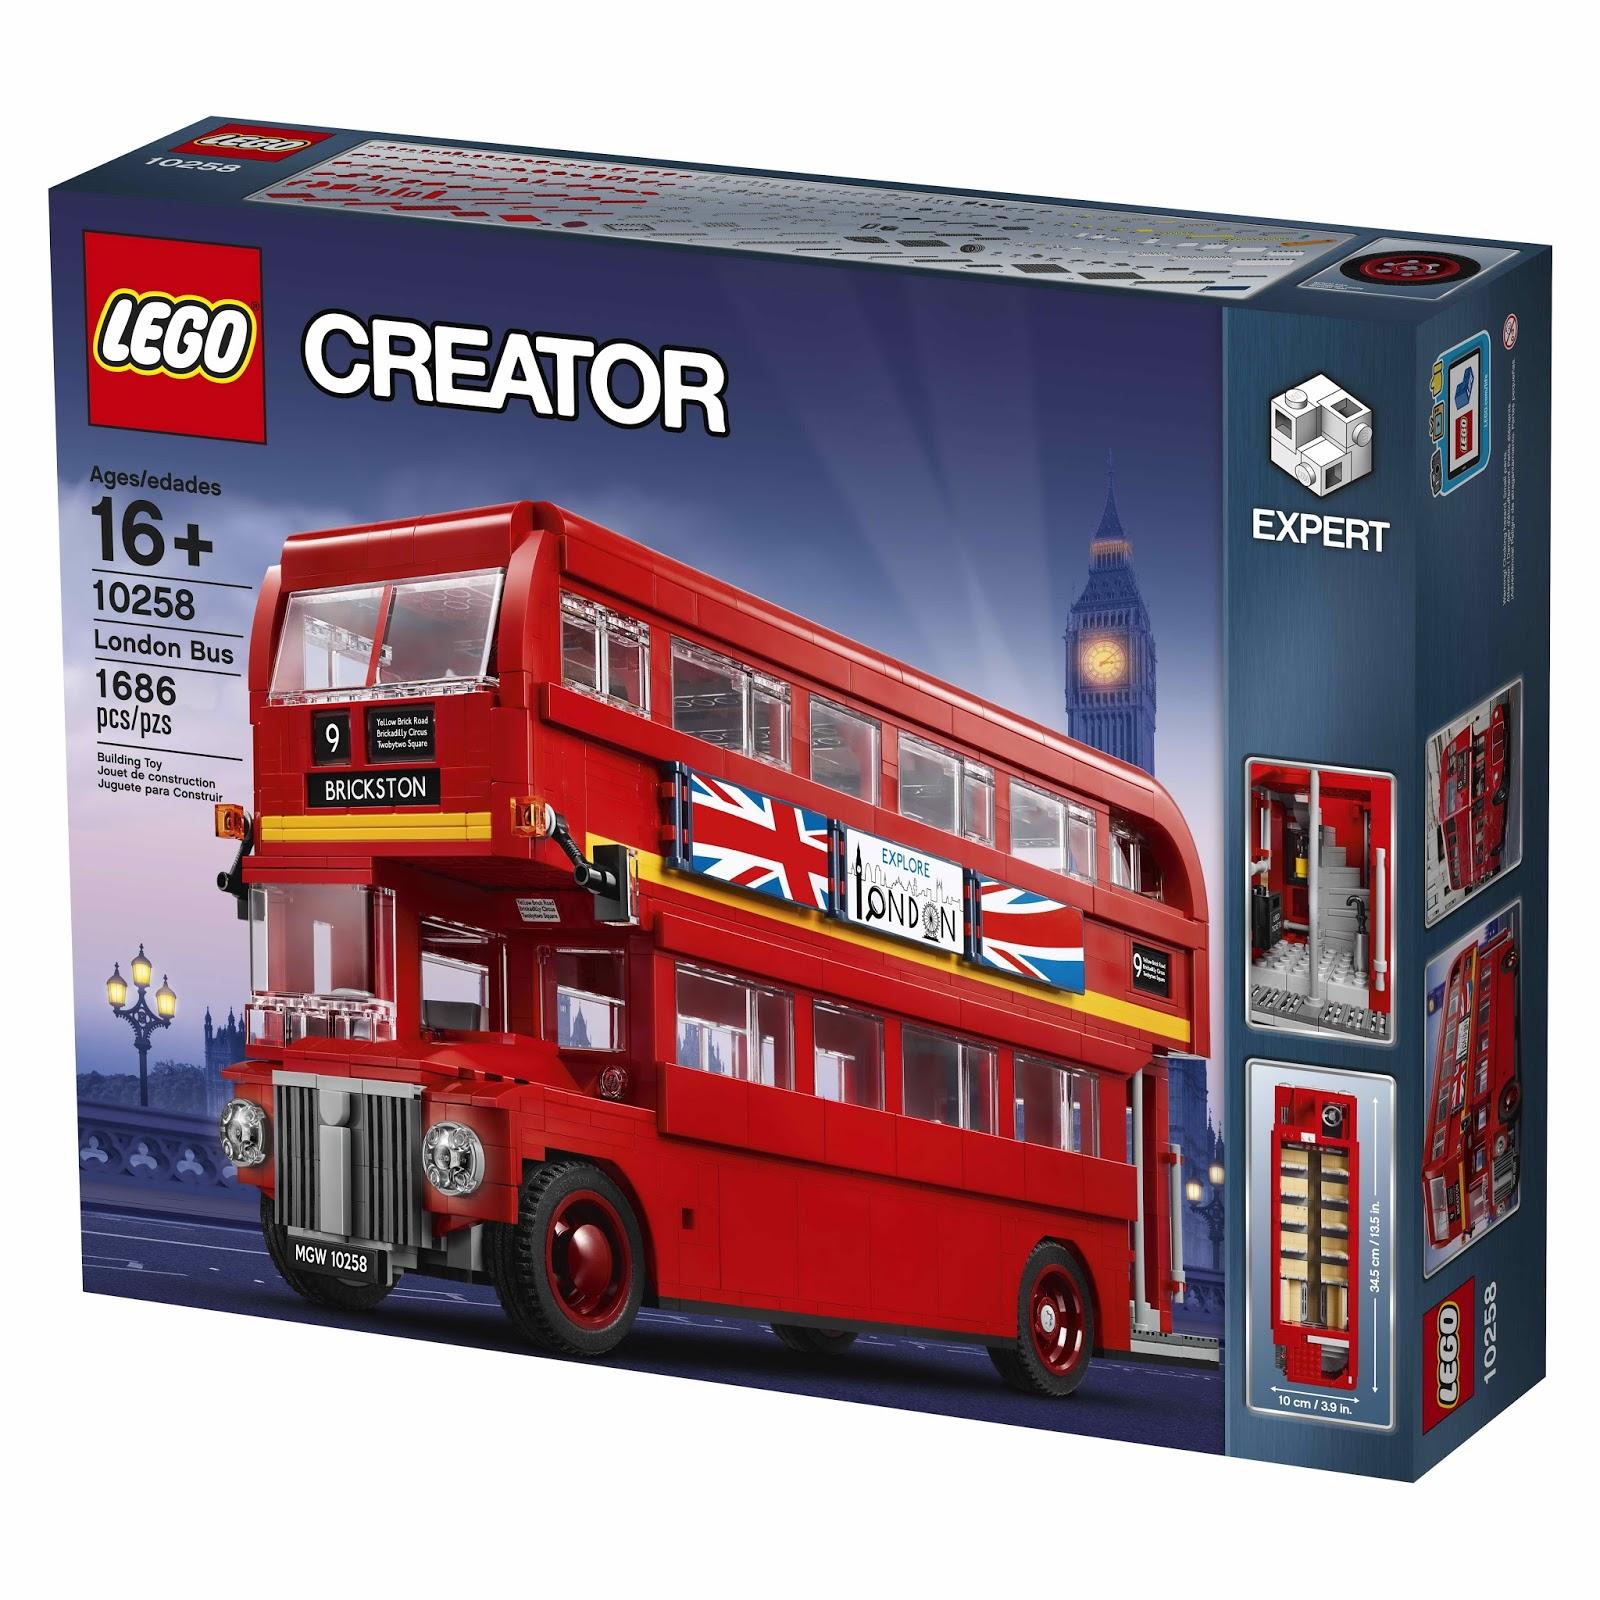 LEGO Creator Expert 10258 London Bus - £90 @ Hamleys with code